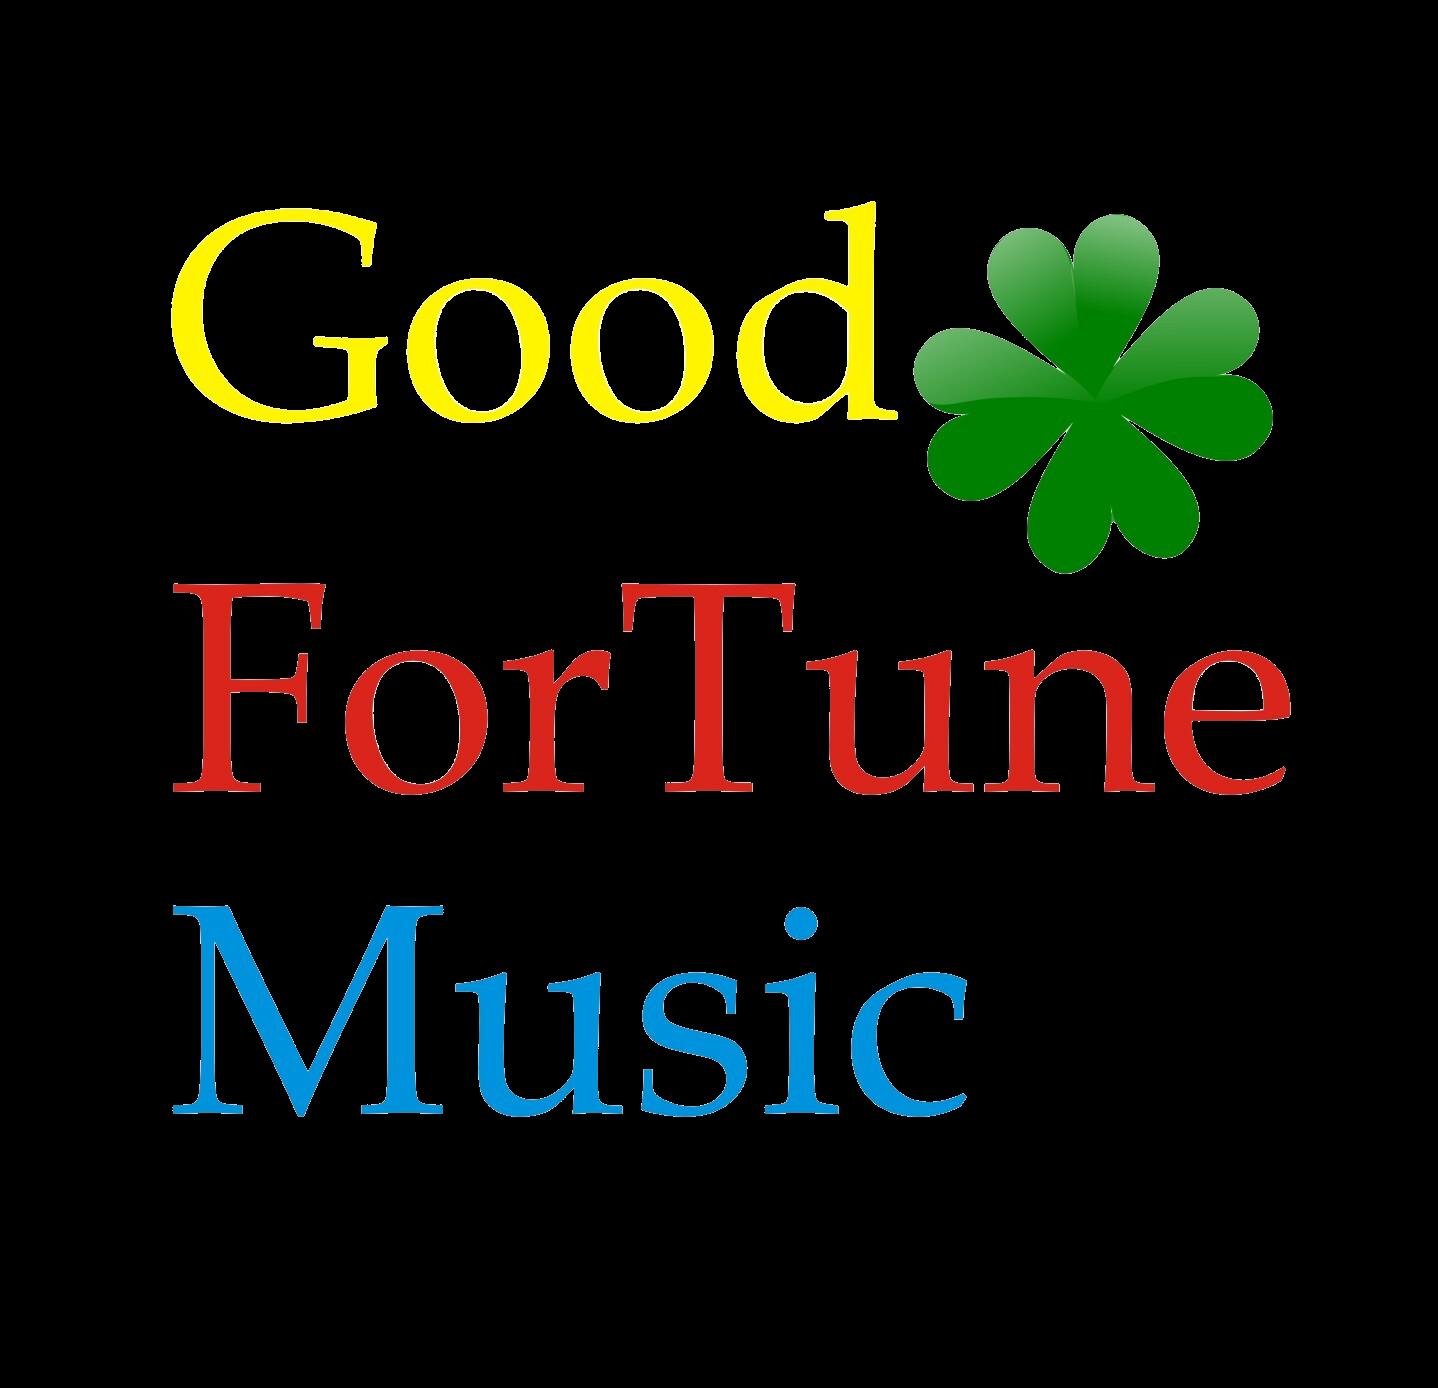 Good ForTune Music